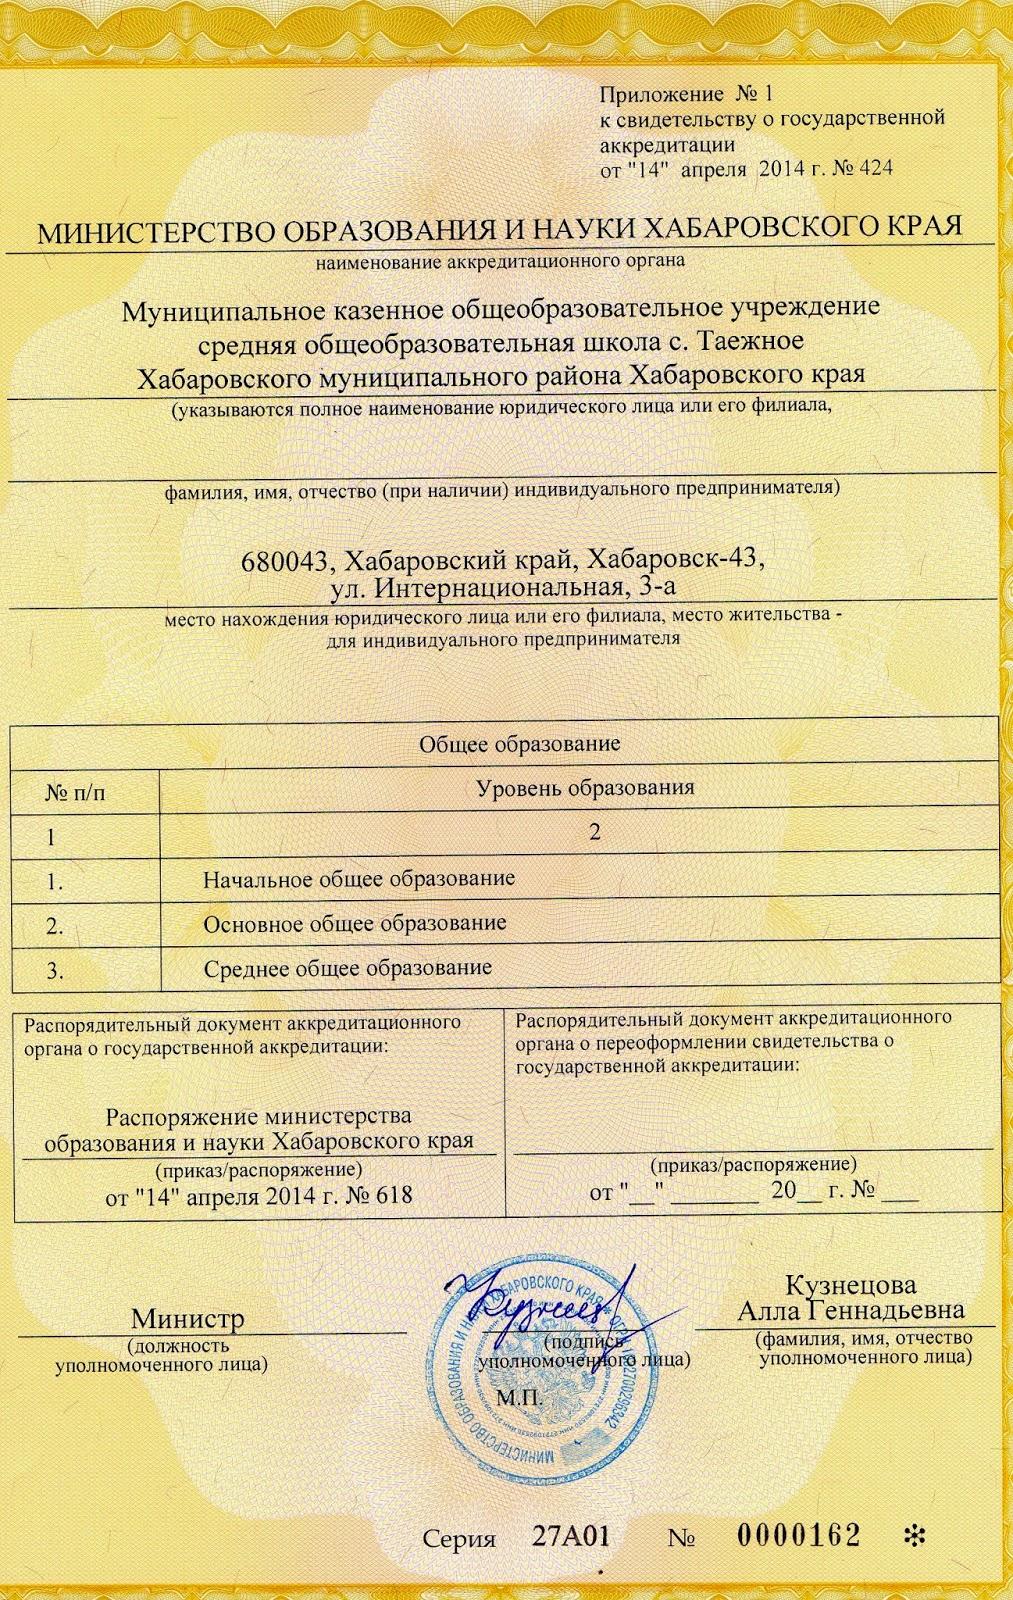 Приказ Министерства образования и науки РФ от 2 июля 2013